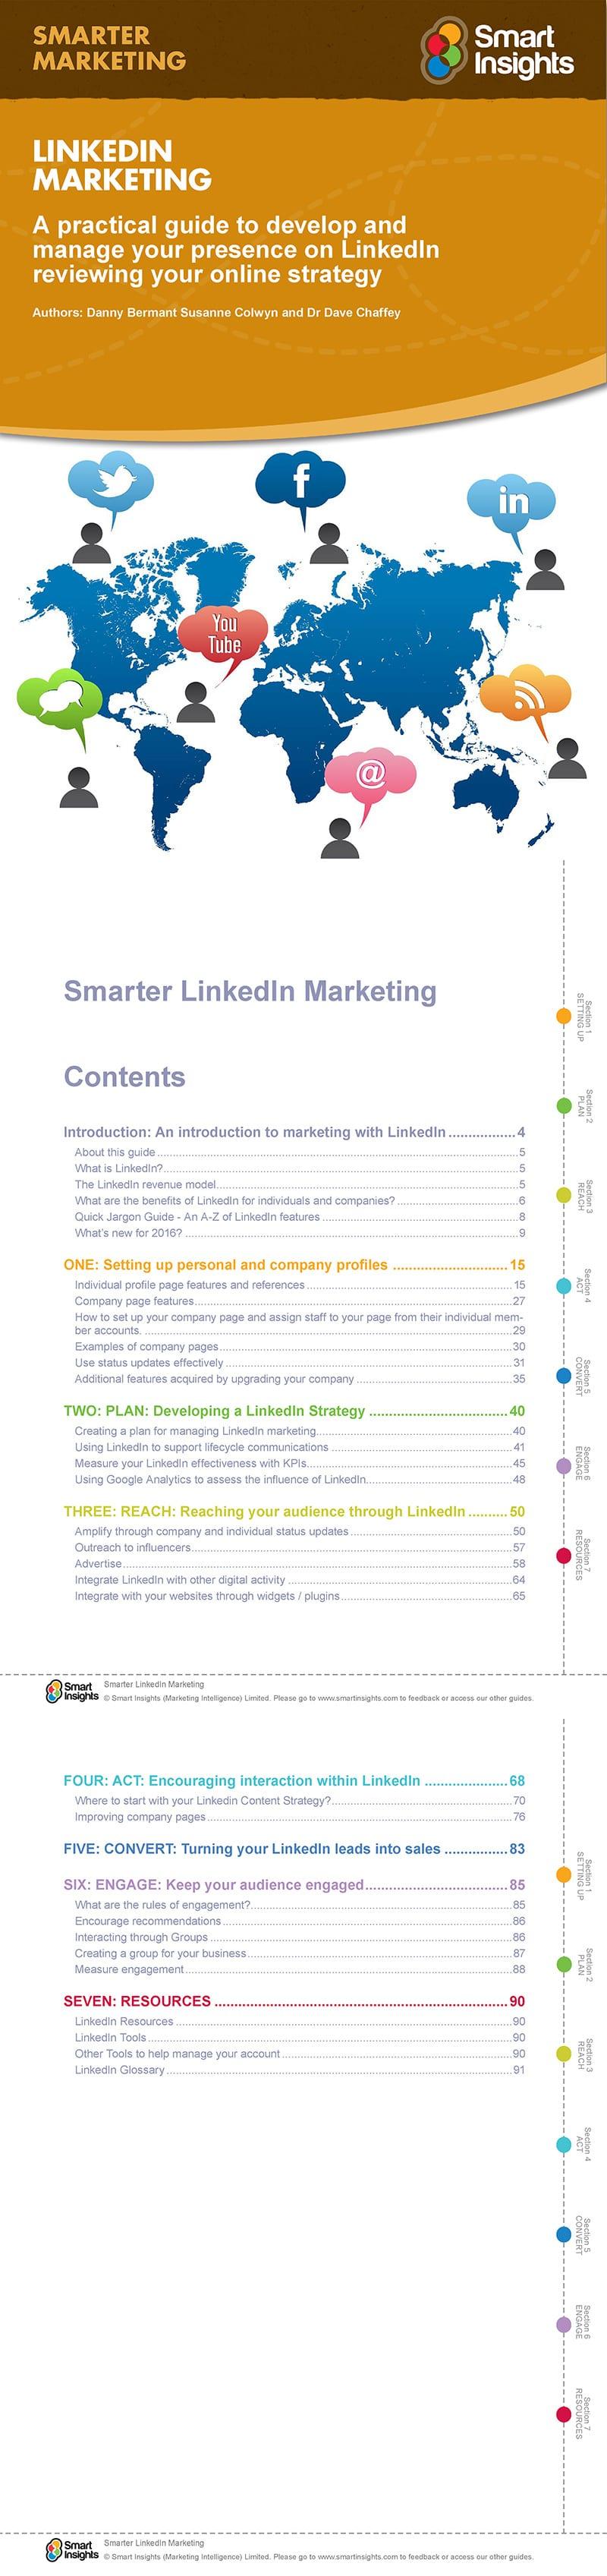 Smarter LinkedIn marketing guide